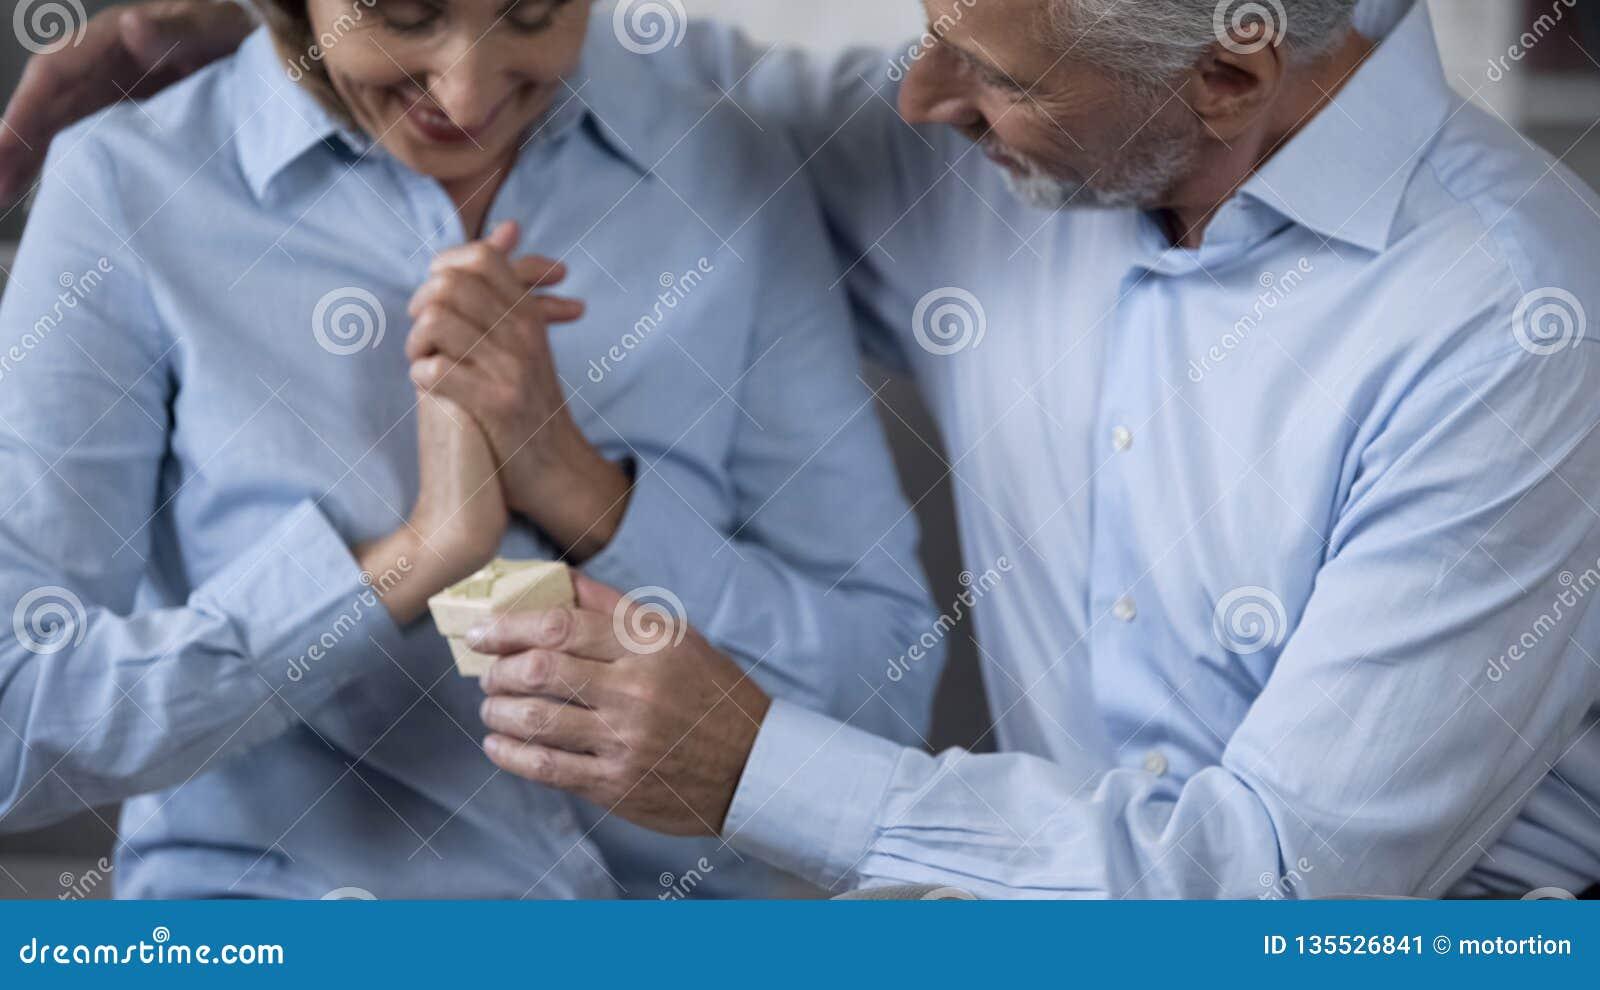 Senior man presenting gift to happy surprised wife, celebrating anniversary